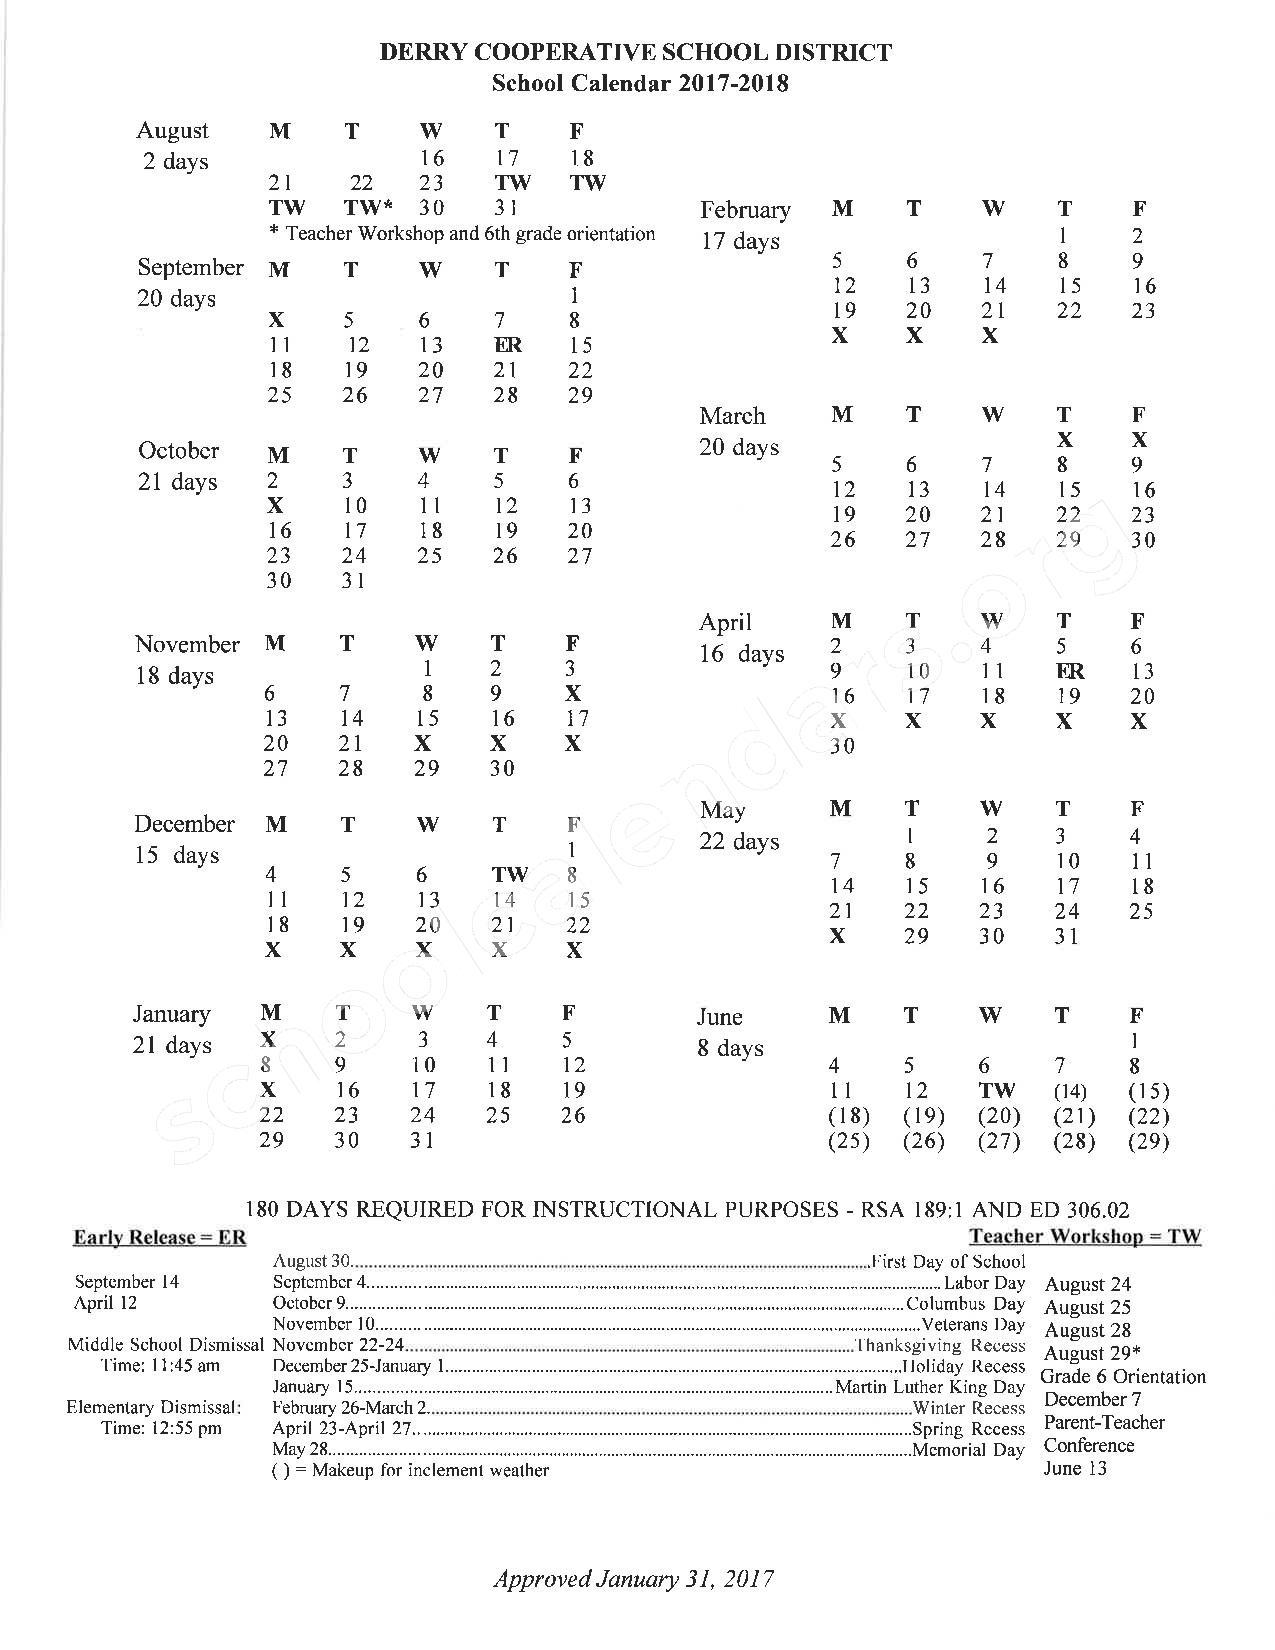 2017 - 2018 District Calendar – SAU 10 - Derry Cooperative School District – page 1